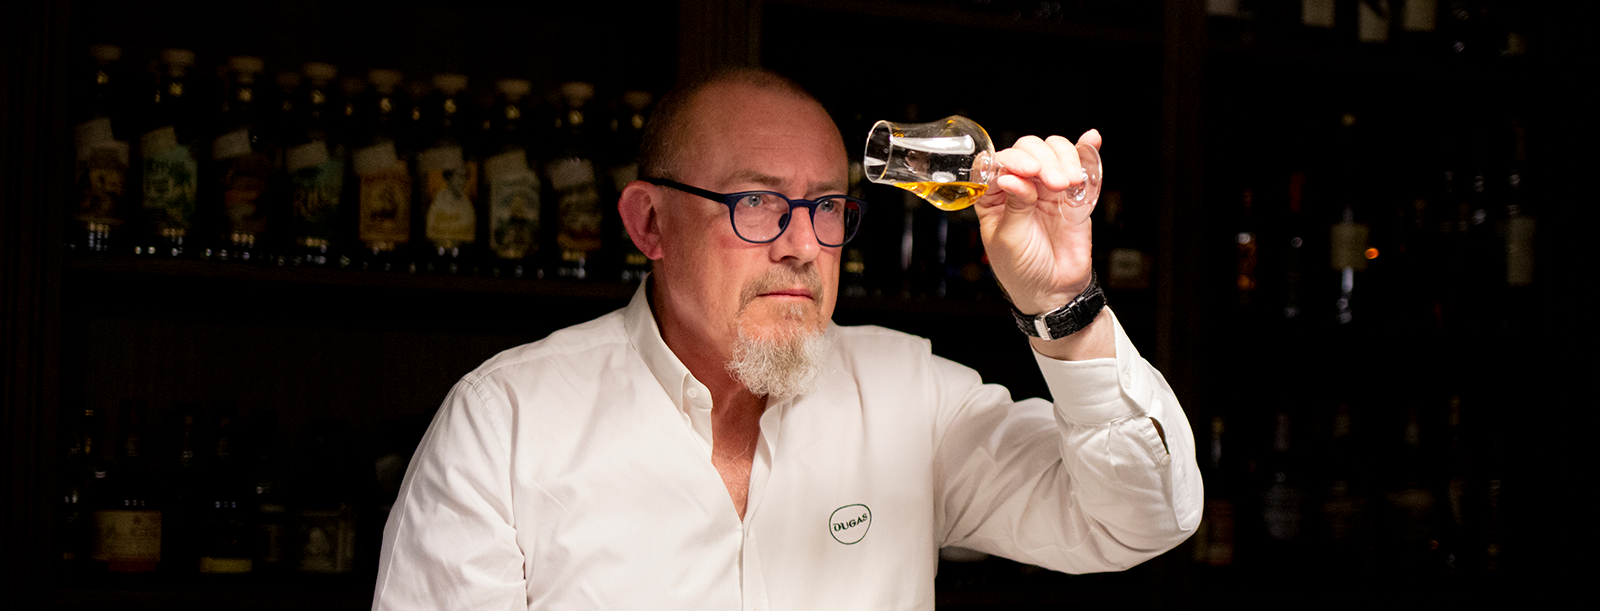 Eric Delrue Brand Ambassadeur Whisky Dugas Club Expert Spiritueux